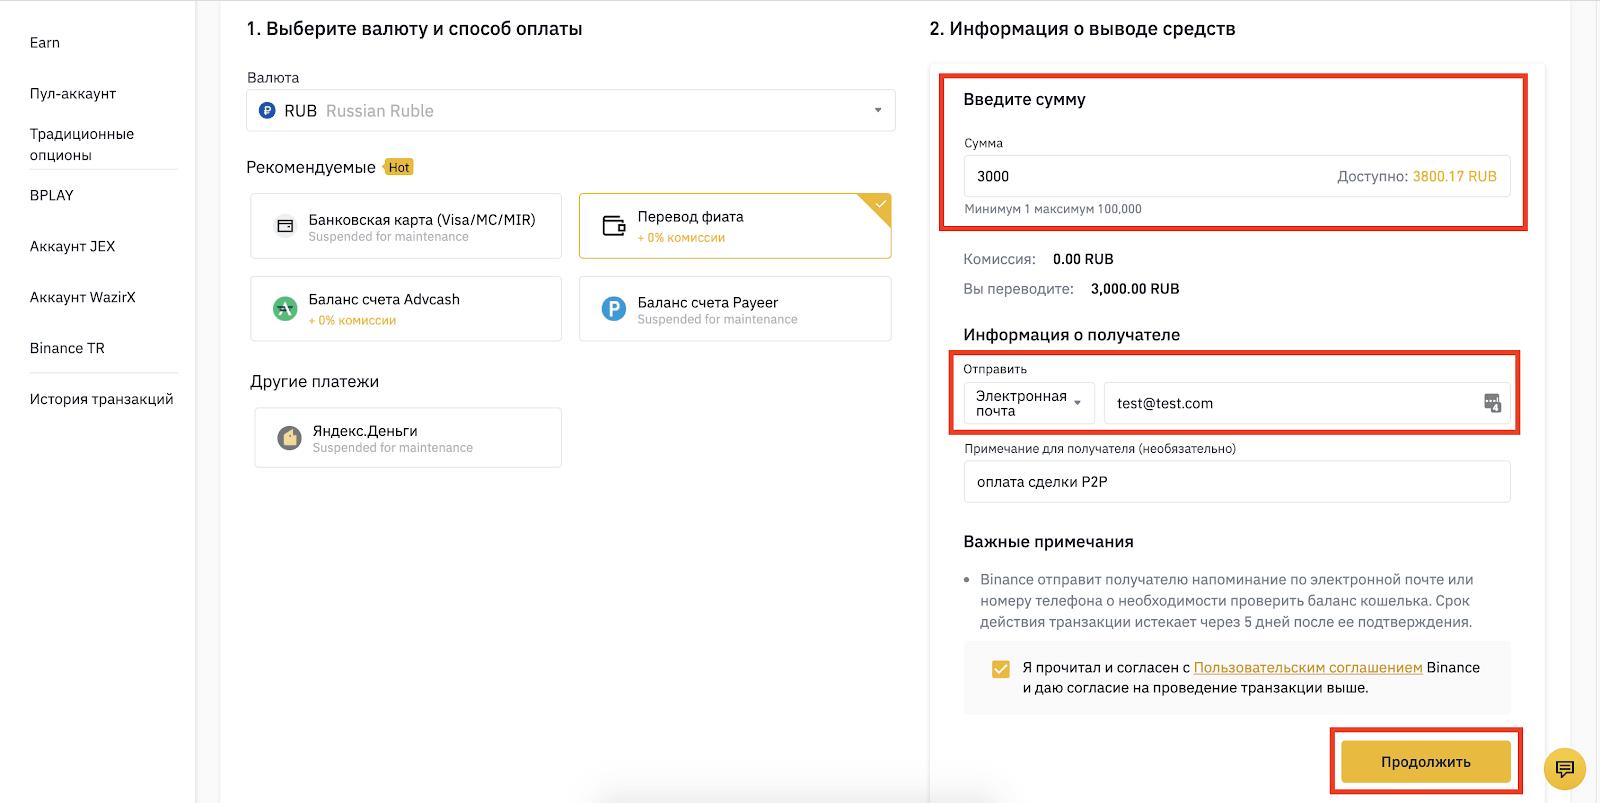 breve btc su binance dollaro al bitcoin